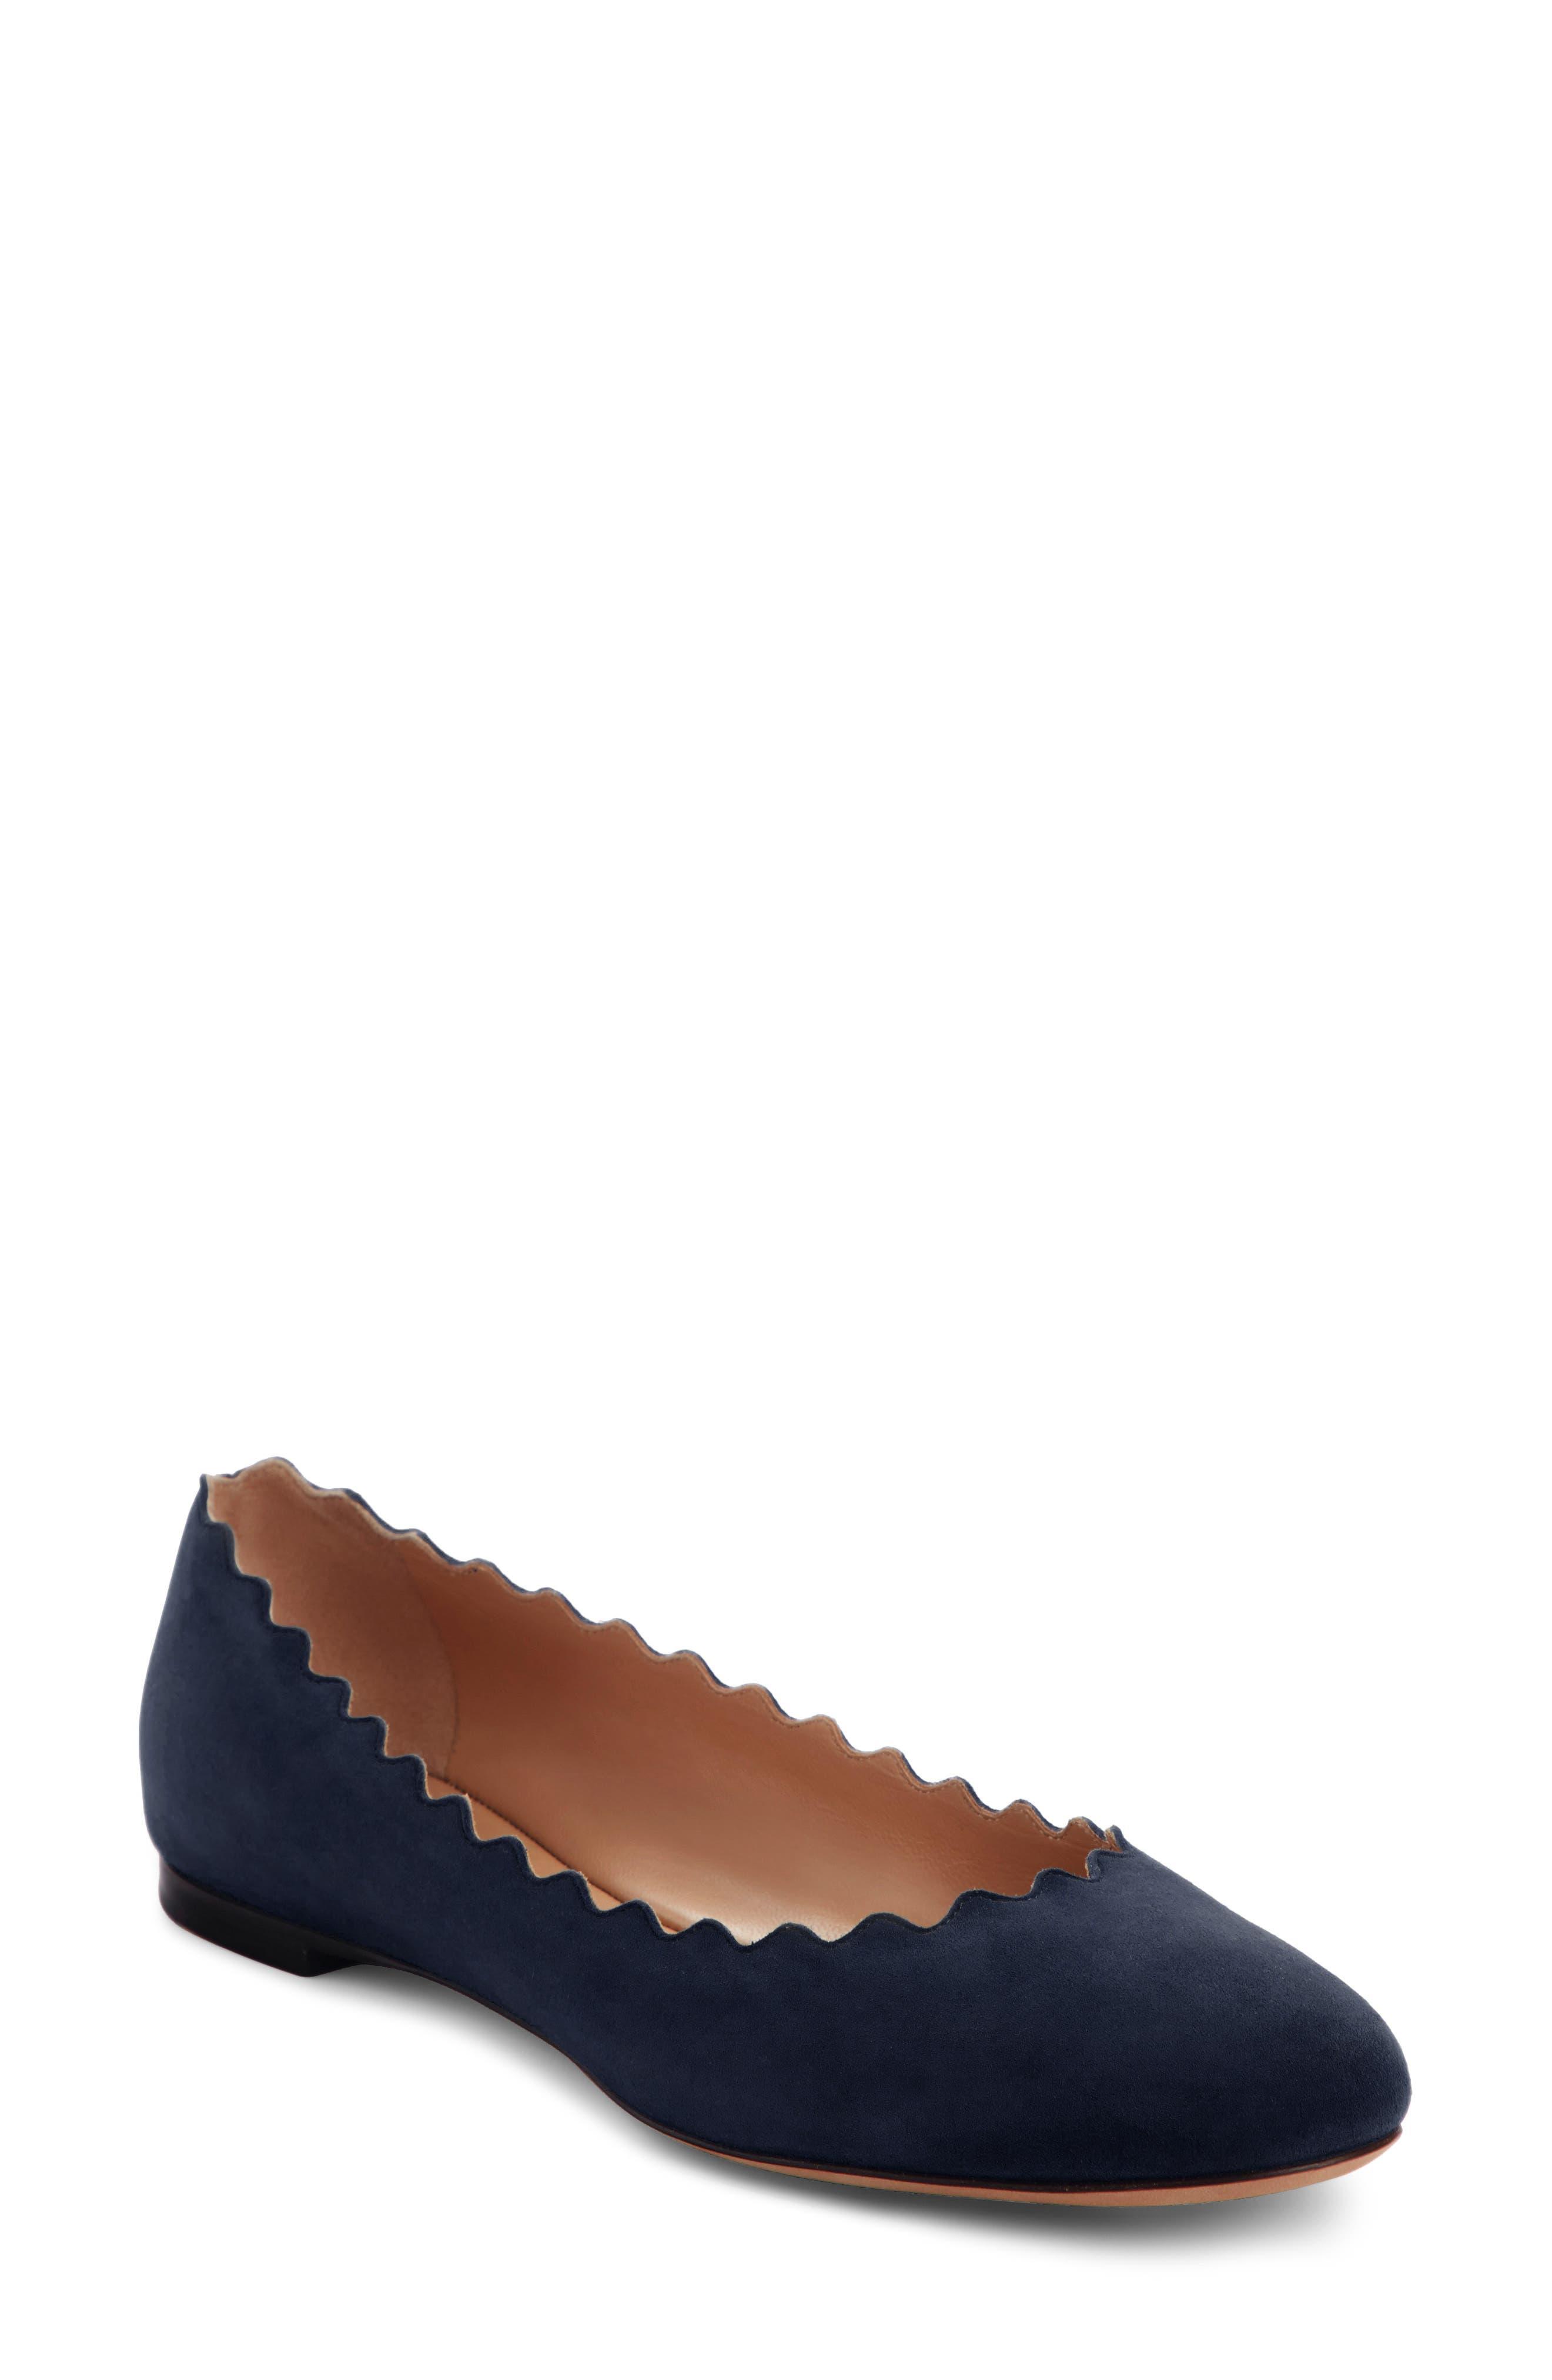 CHLOÉ 'Lauren' Scalloped Ballet Flat, Main, color, MAJOLICA BLUE